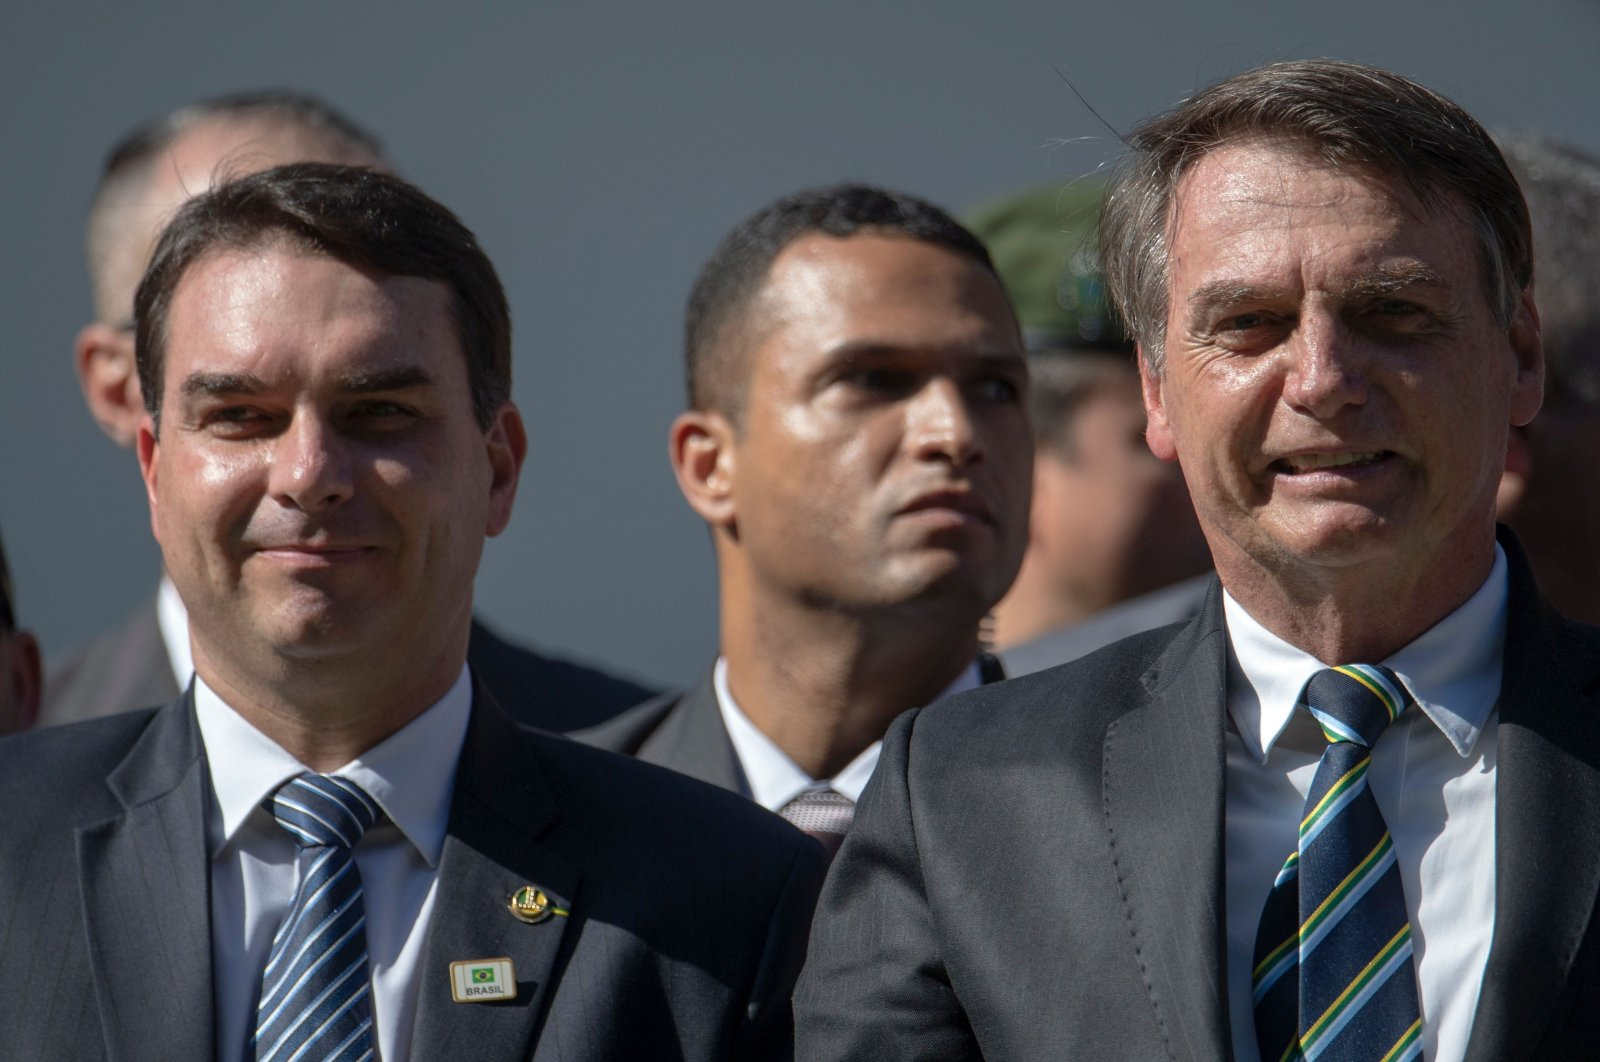 Brazilian President Jair Bolsonaro (R) and his son Flavio Bolsonaro attend a ceremony marking the 130th anniversary of the Rio de Janeiro Military School (CMRJ), in Rio de Janeiro, Brazil, May 6, 2019. (AFP Photo)